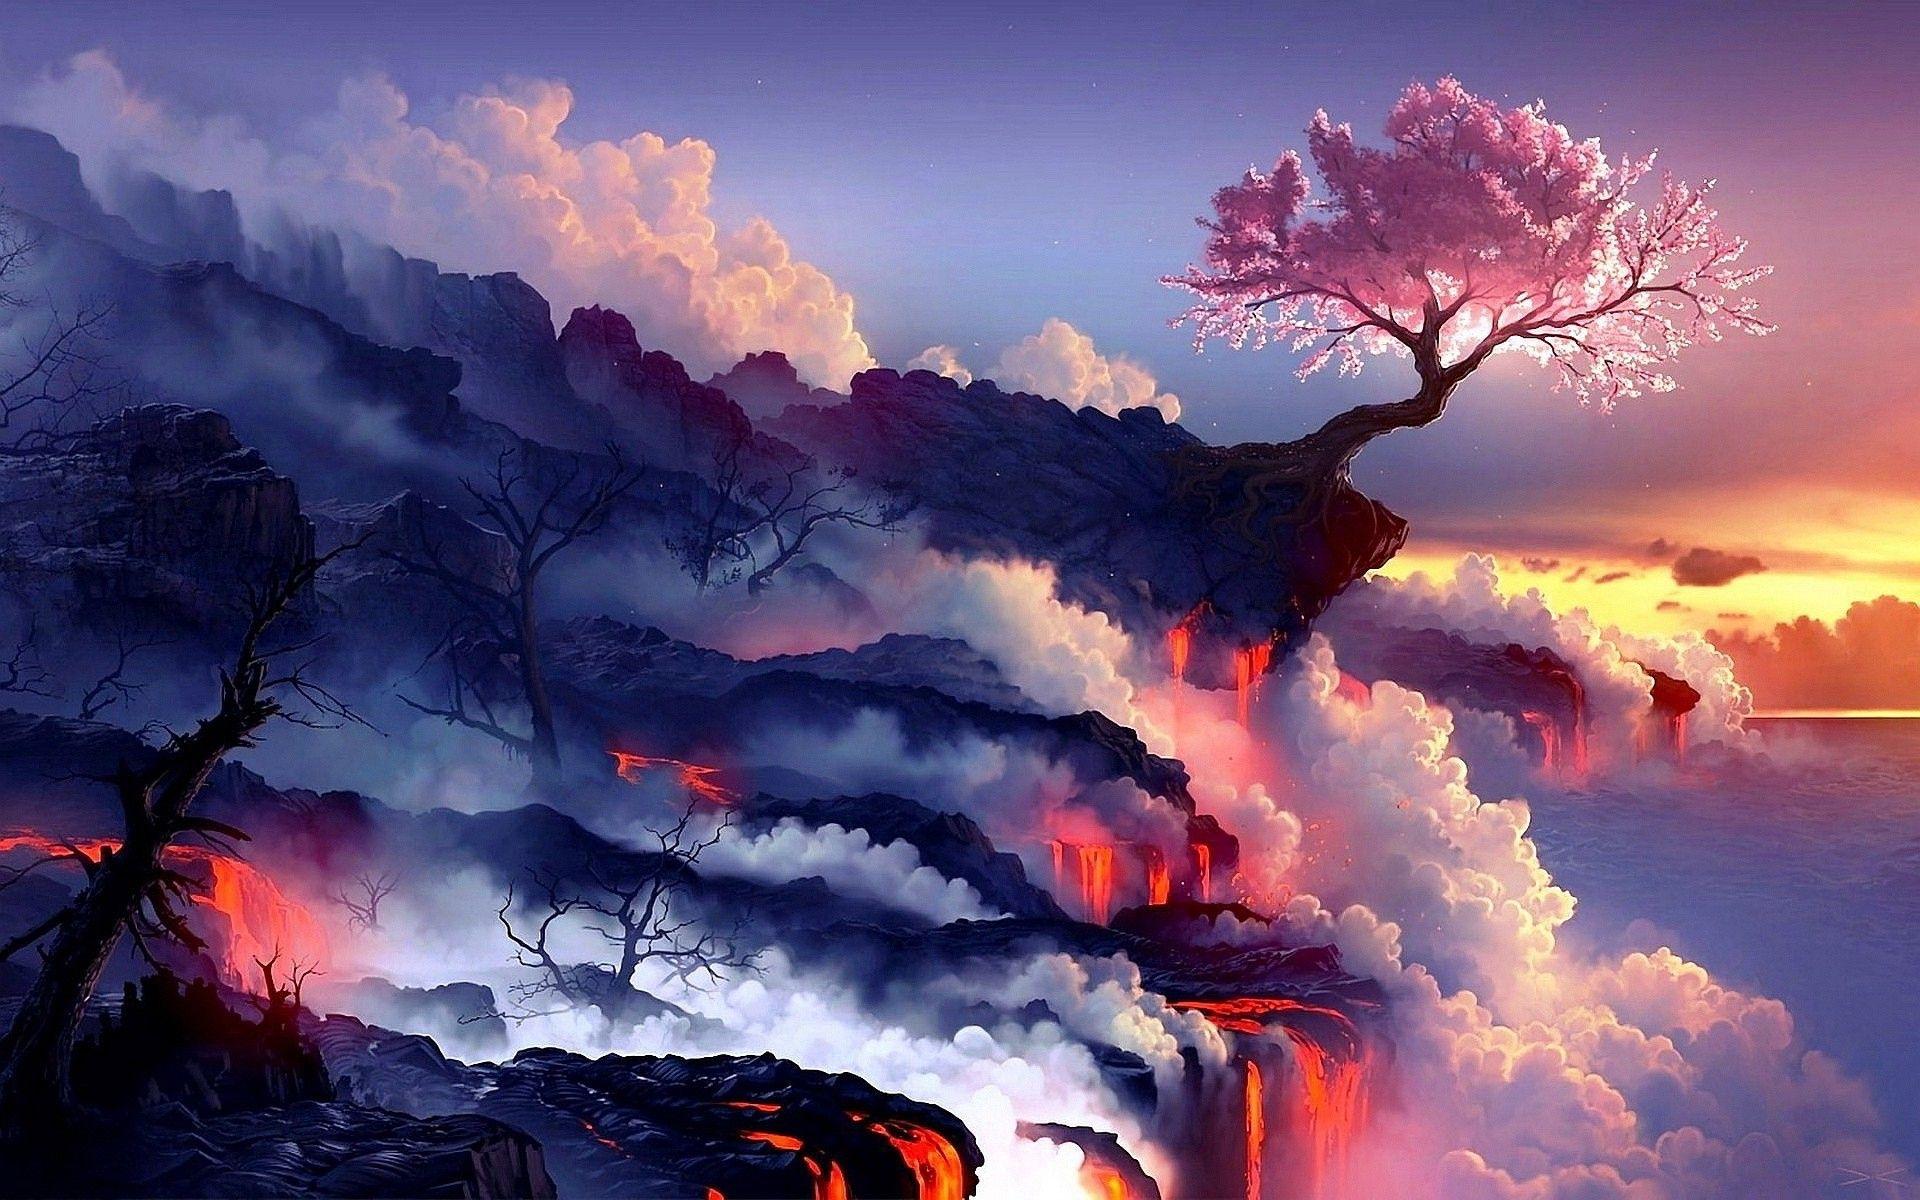 Res 1920x1200 K Ultra Hd Textures Wallpapers Desktop Backgrounds Hd Pictures 1920a 1200 Landscape Wallpaper Fantasy Landscape Volcano Wallpaper